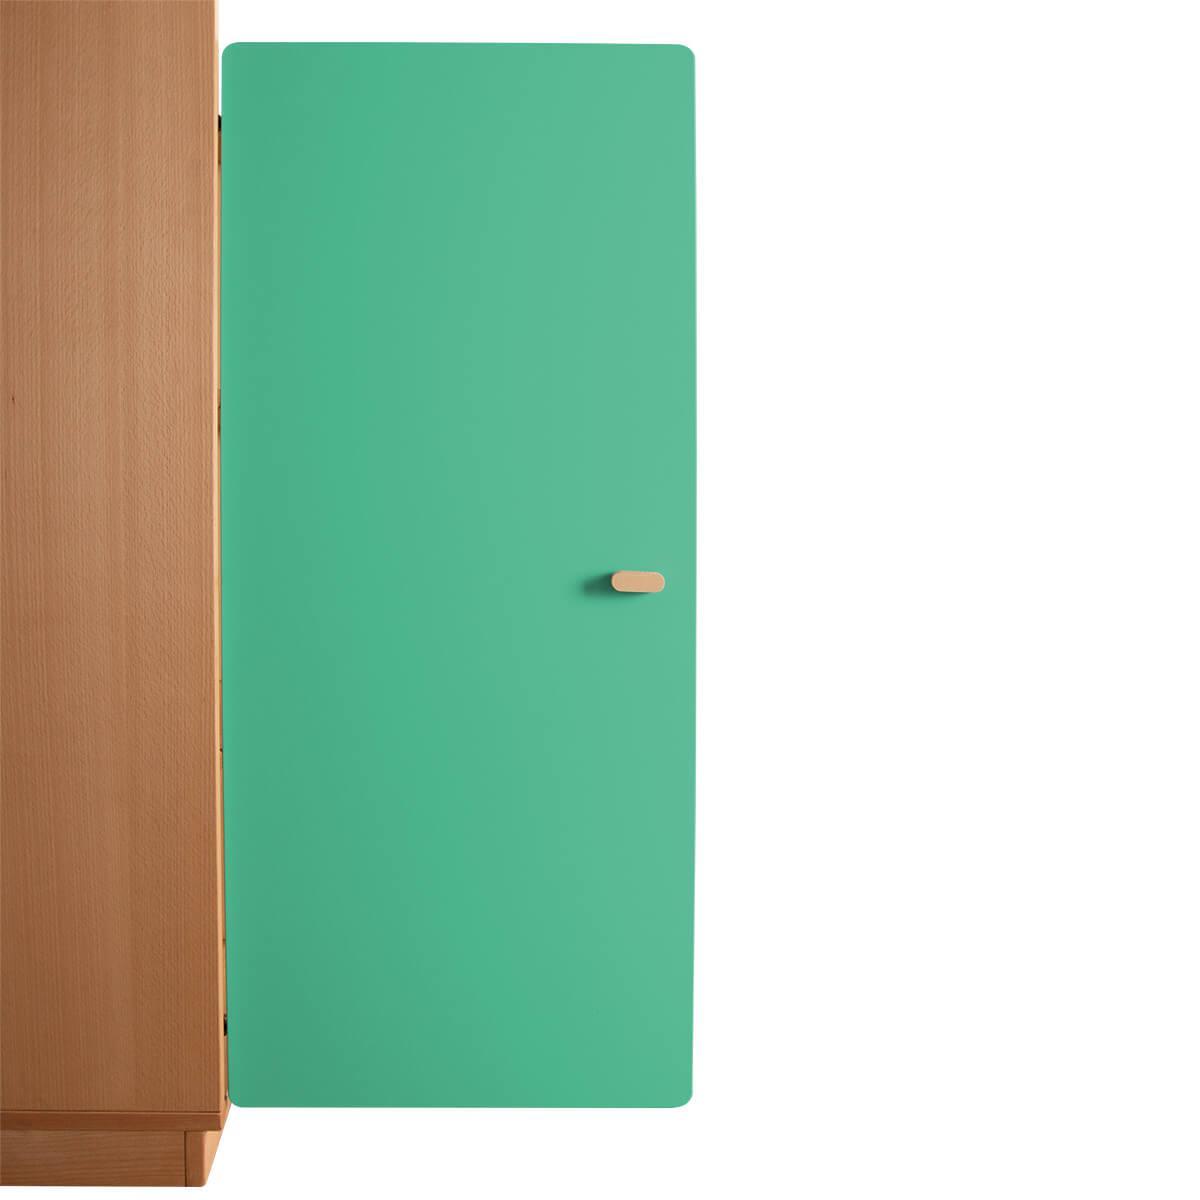 Schranktür 3/5 106cm-Griff DESTYLE de Breuyn MDF grün-lackiert